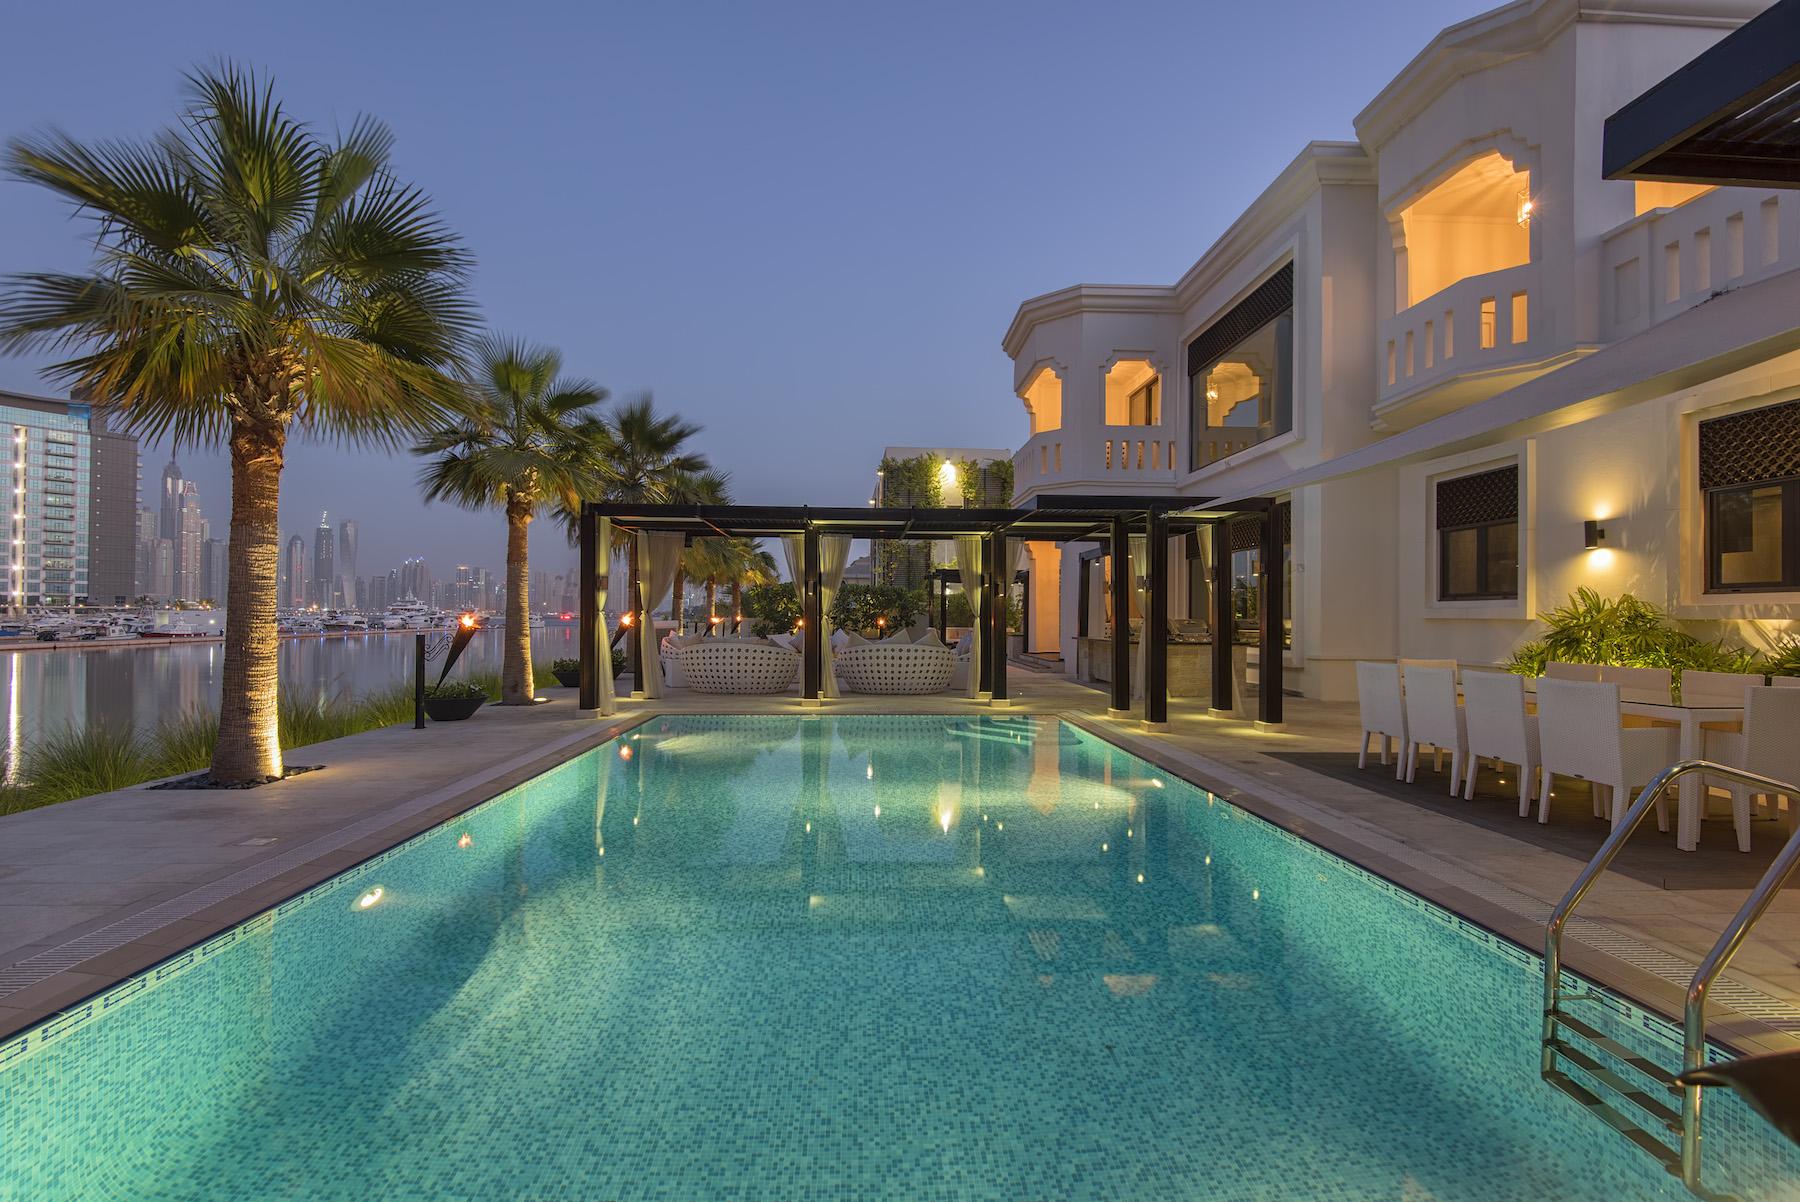 Single Family Home for Sale at Italian Luxury Beachfront Living at Palm Jumeirah Dubai, Dubai United Arab Emirates